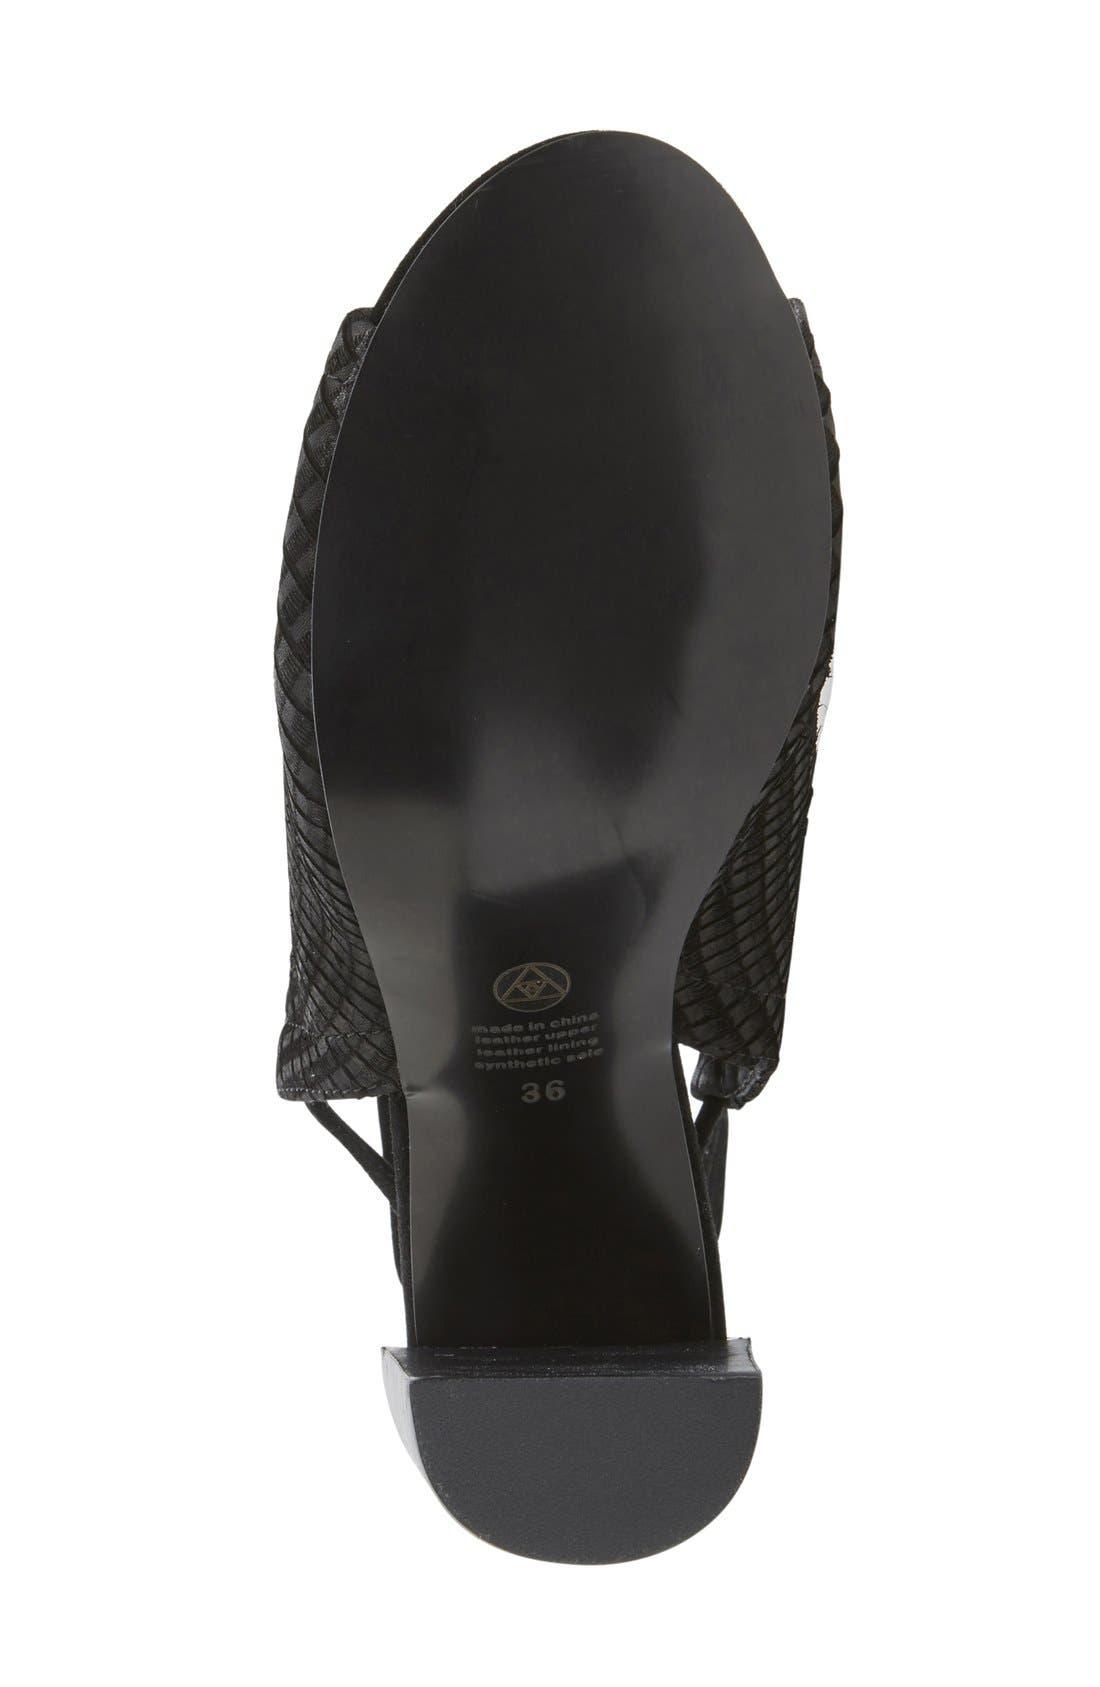 Alternate Image 4  - Urge Footwear 'Eve' Lace-Up Mule Sandal (Women)